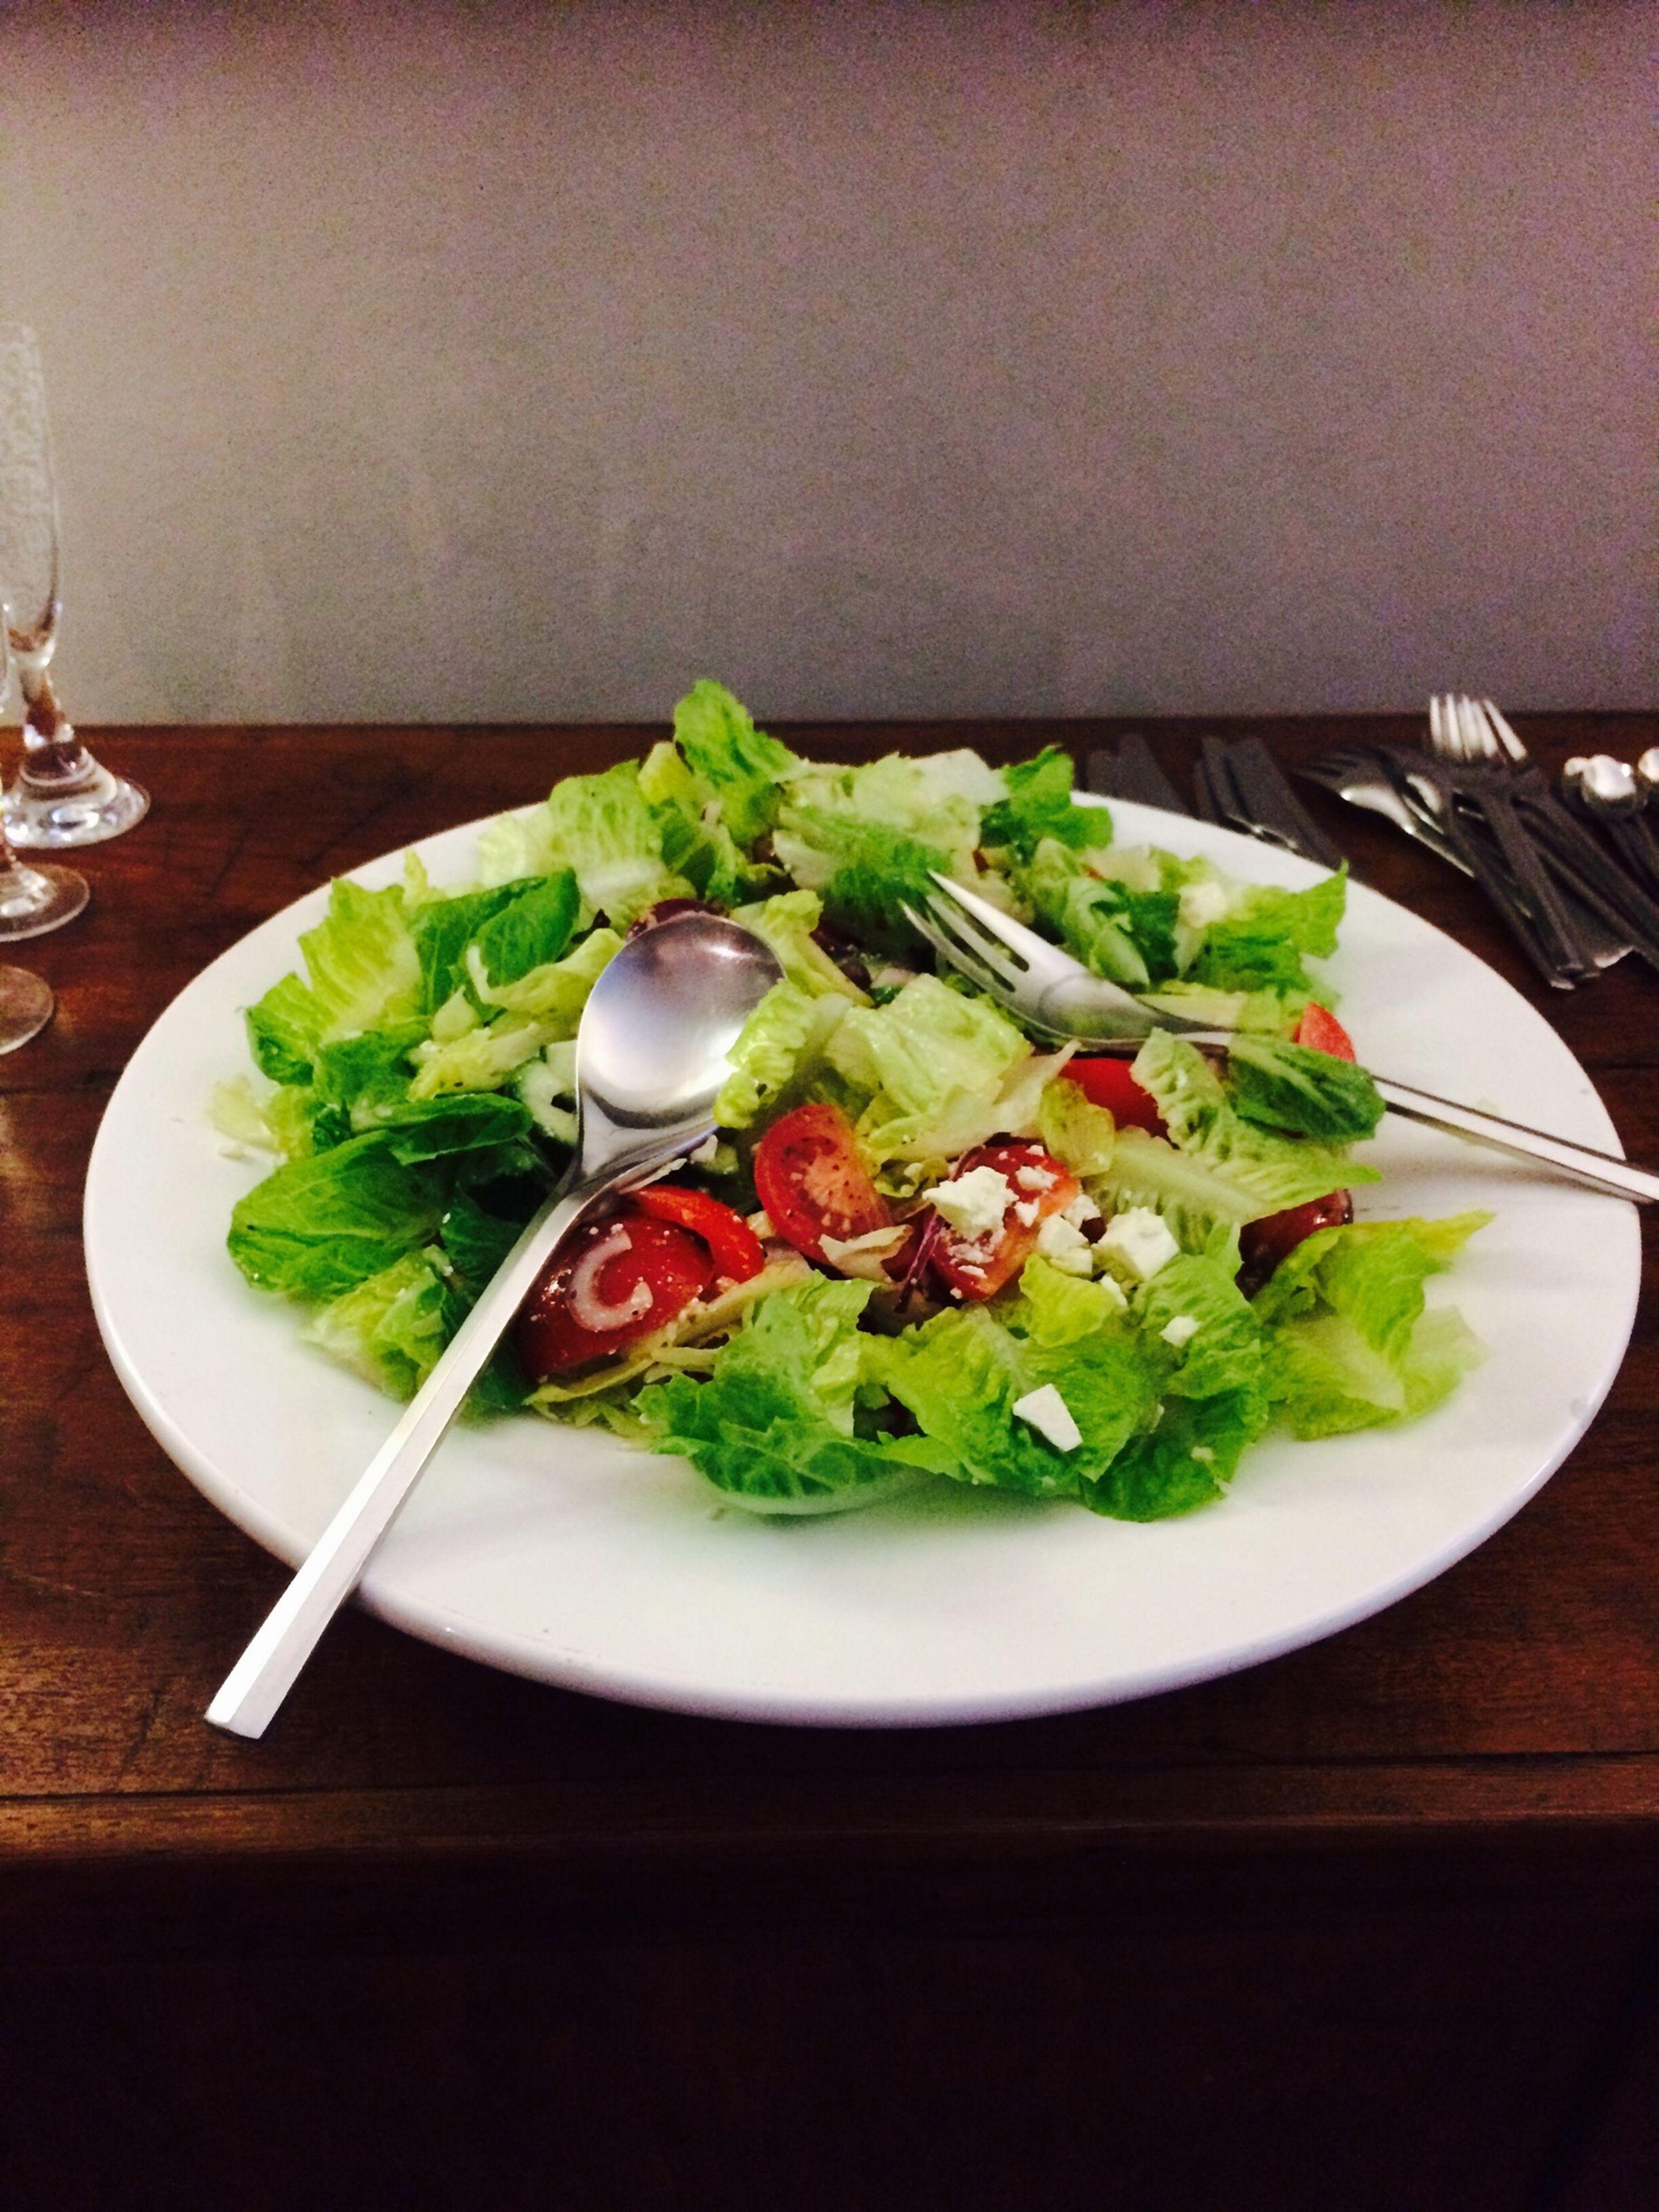 Salad Healthy Green Foodporn Yum had this for dinner lastnight